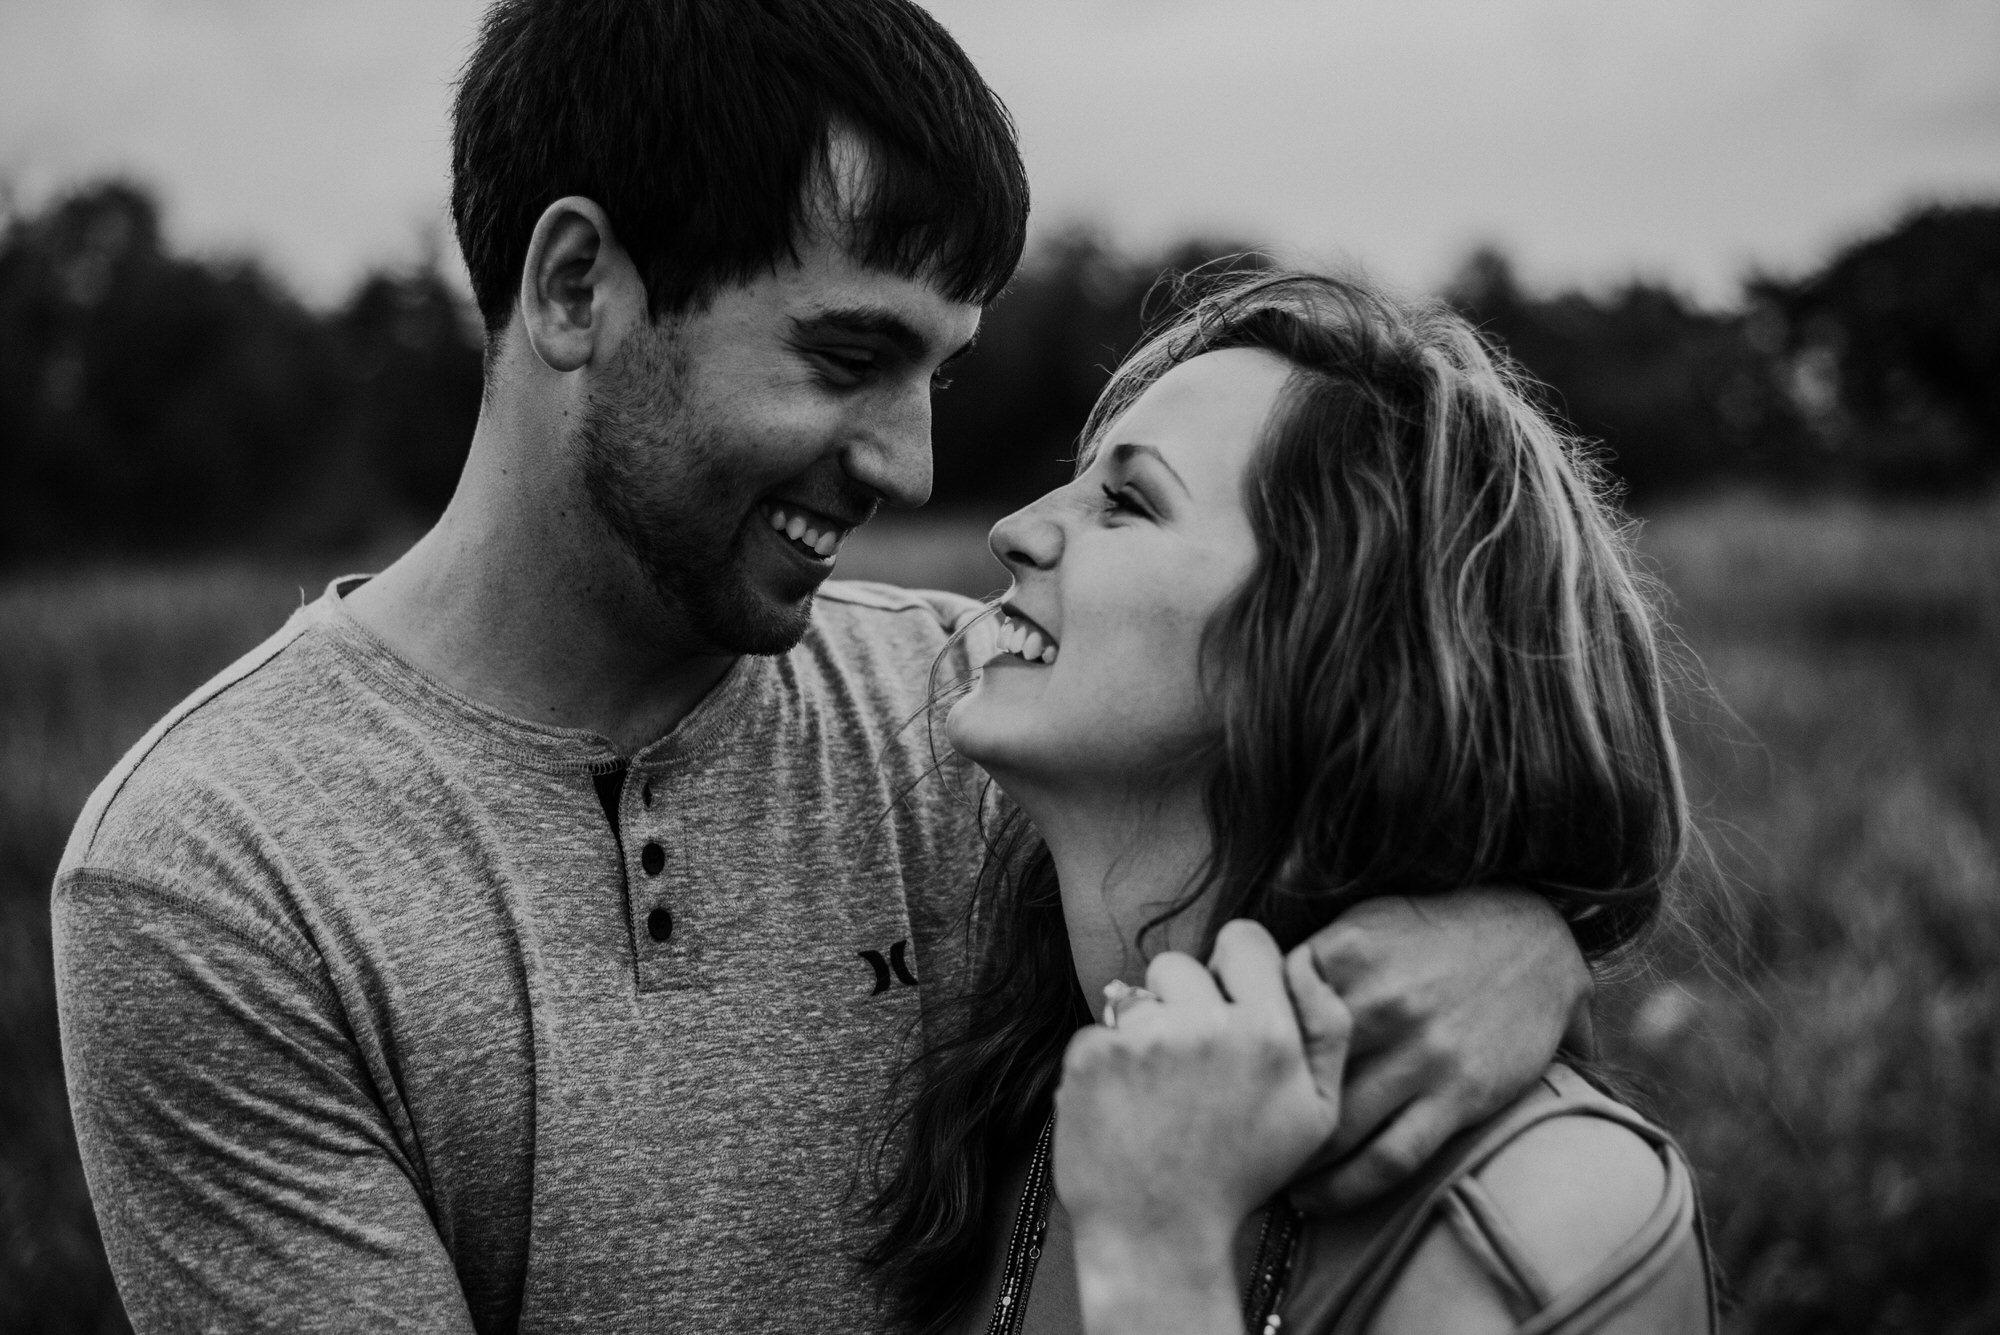 Kaylie-Sirek-Photography-wedding-engagement-photographer-Grand-Island-Kearney-Hastings-Lincoln-Nebraska-central-midwest-moments-trump-posing-natural-light-engaged-20.jpg